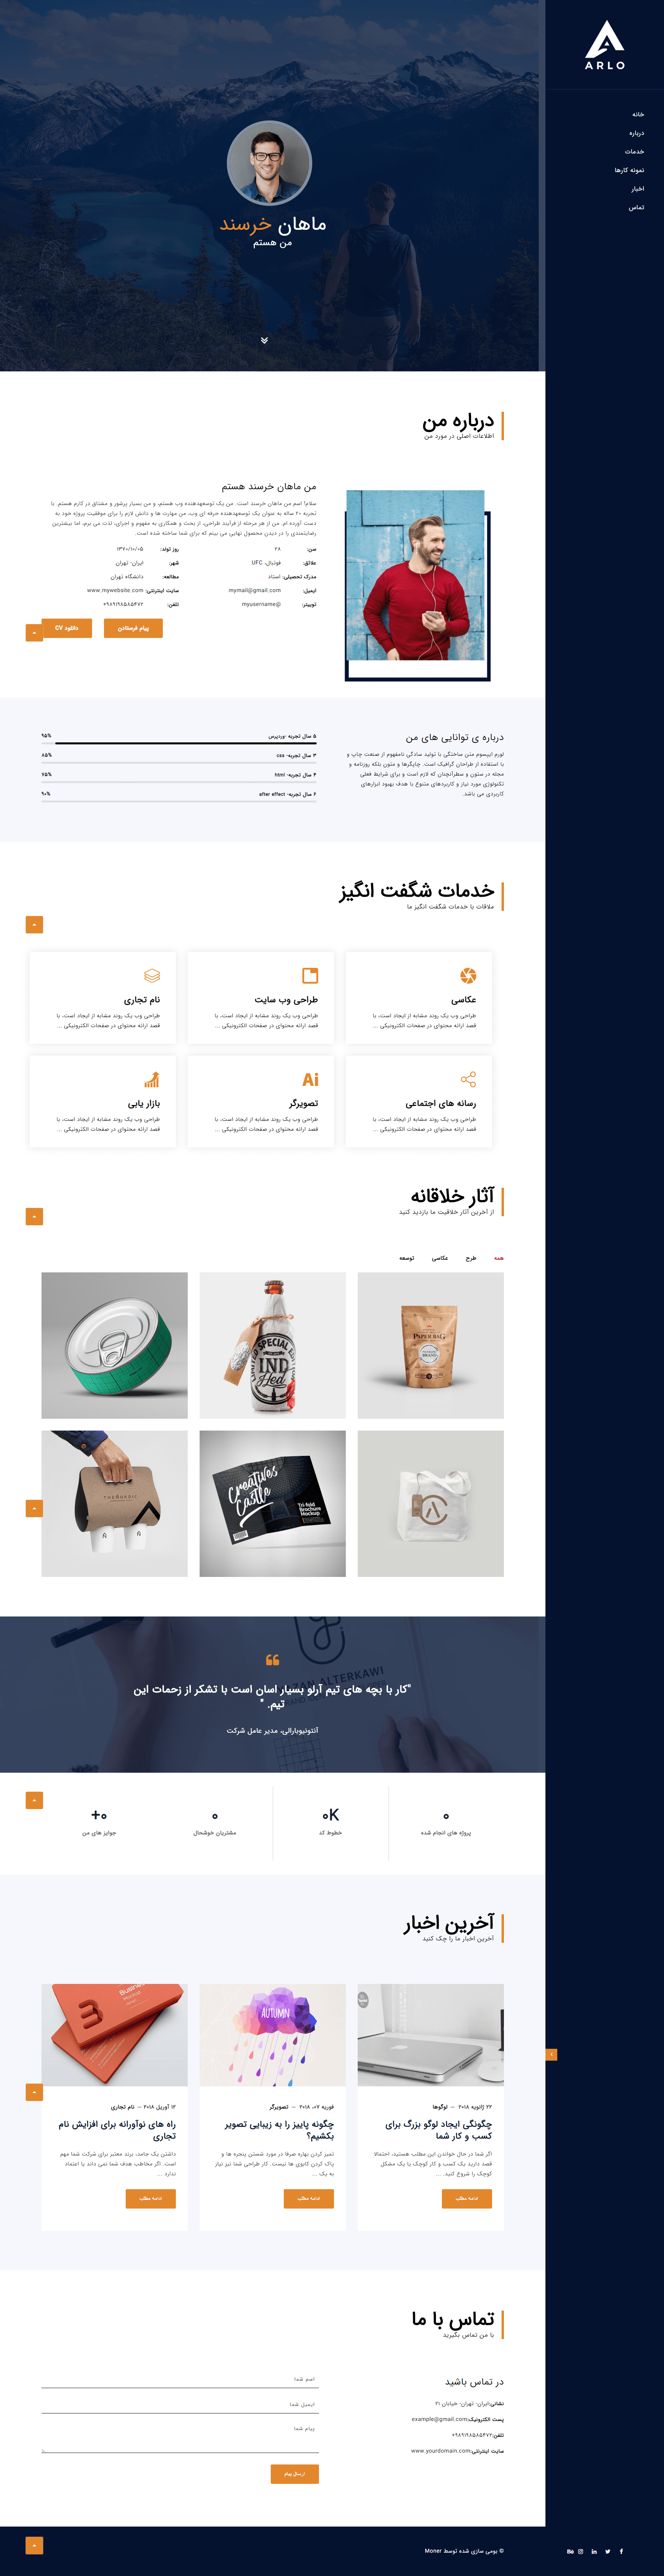 قالب HTML آرلو پوسته سایتشخصی و نمونه کار فارسی